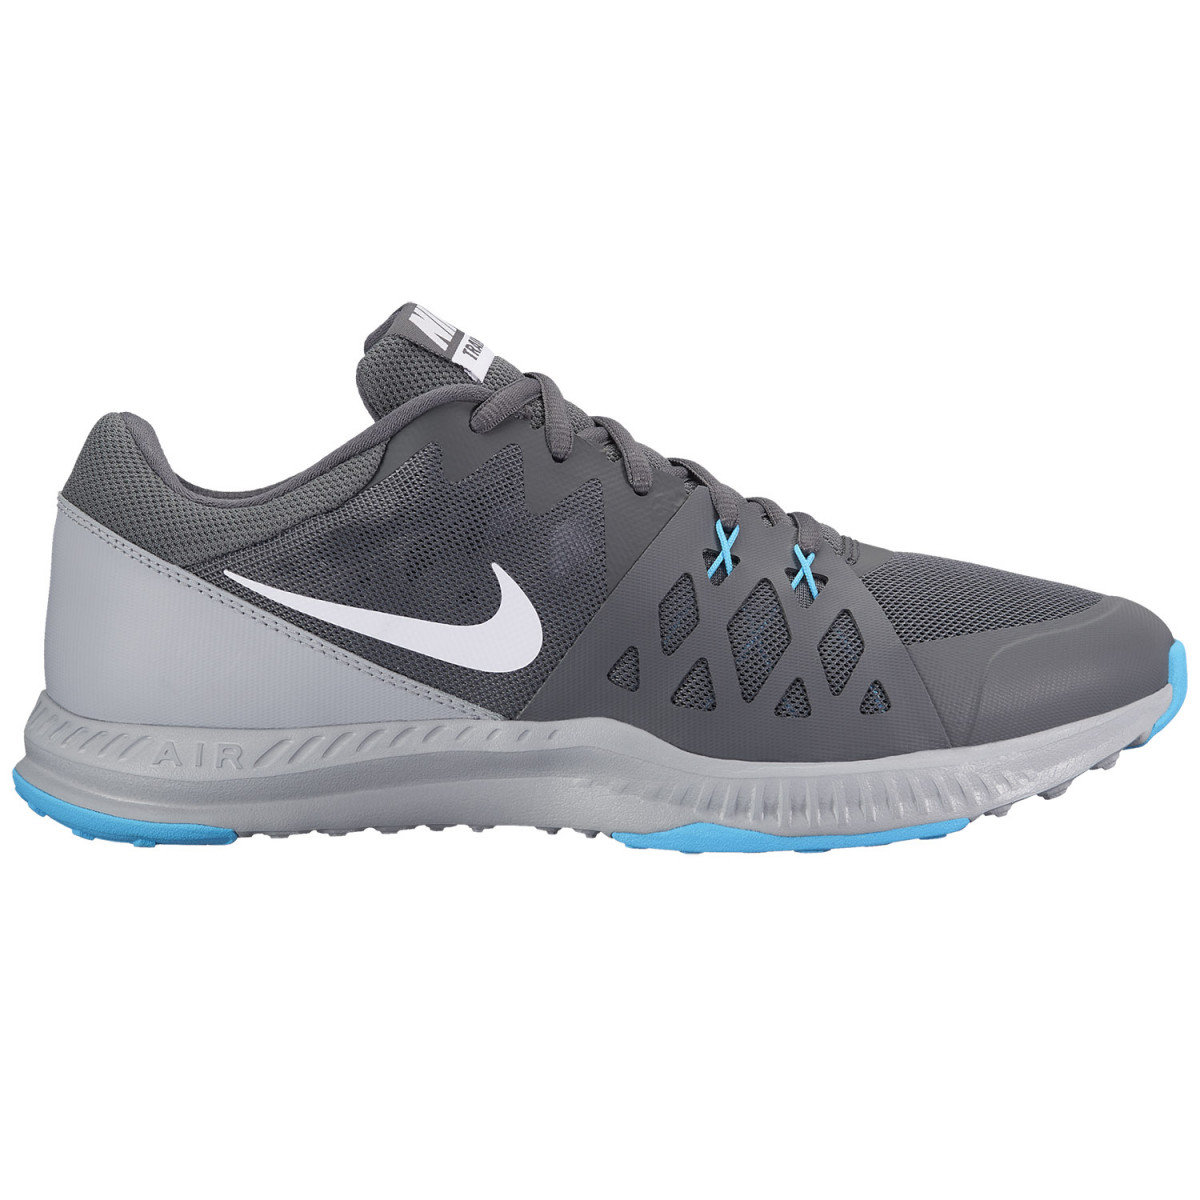 8f5971d98dc83 Zapatillas Nike Air Epic Speed Tr II - Training - Zapatillas - Hombre